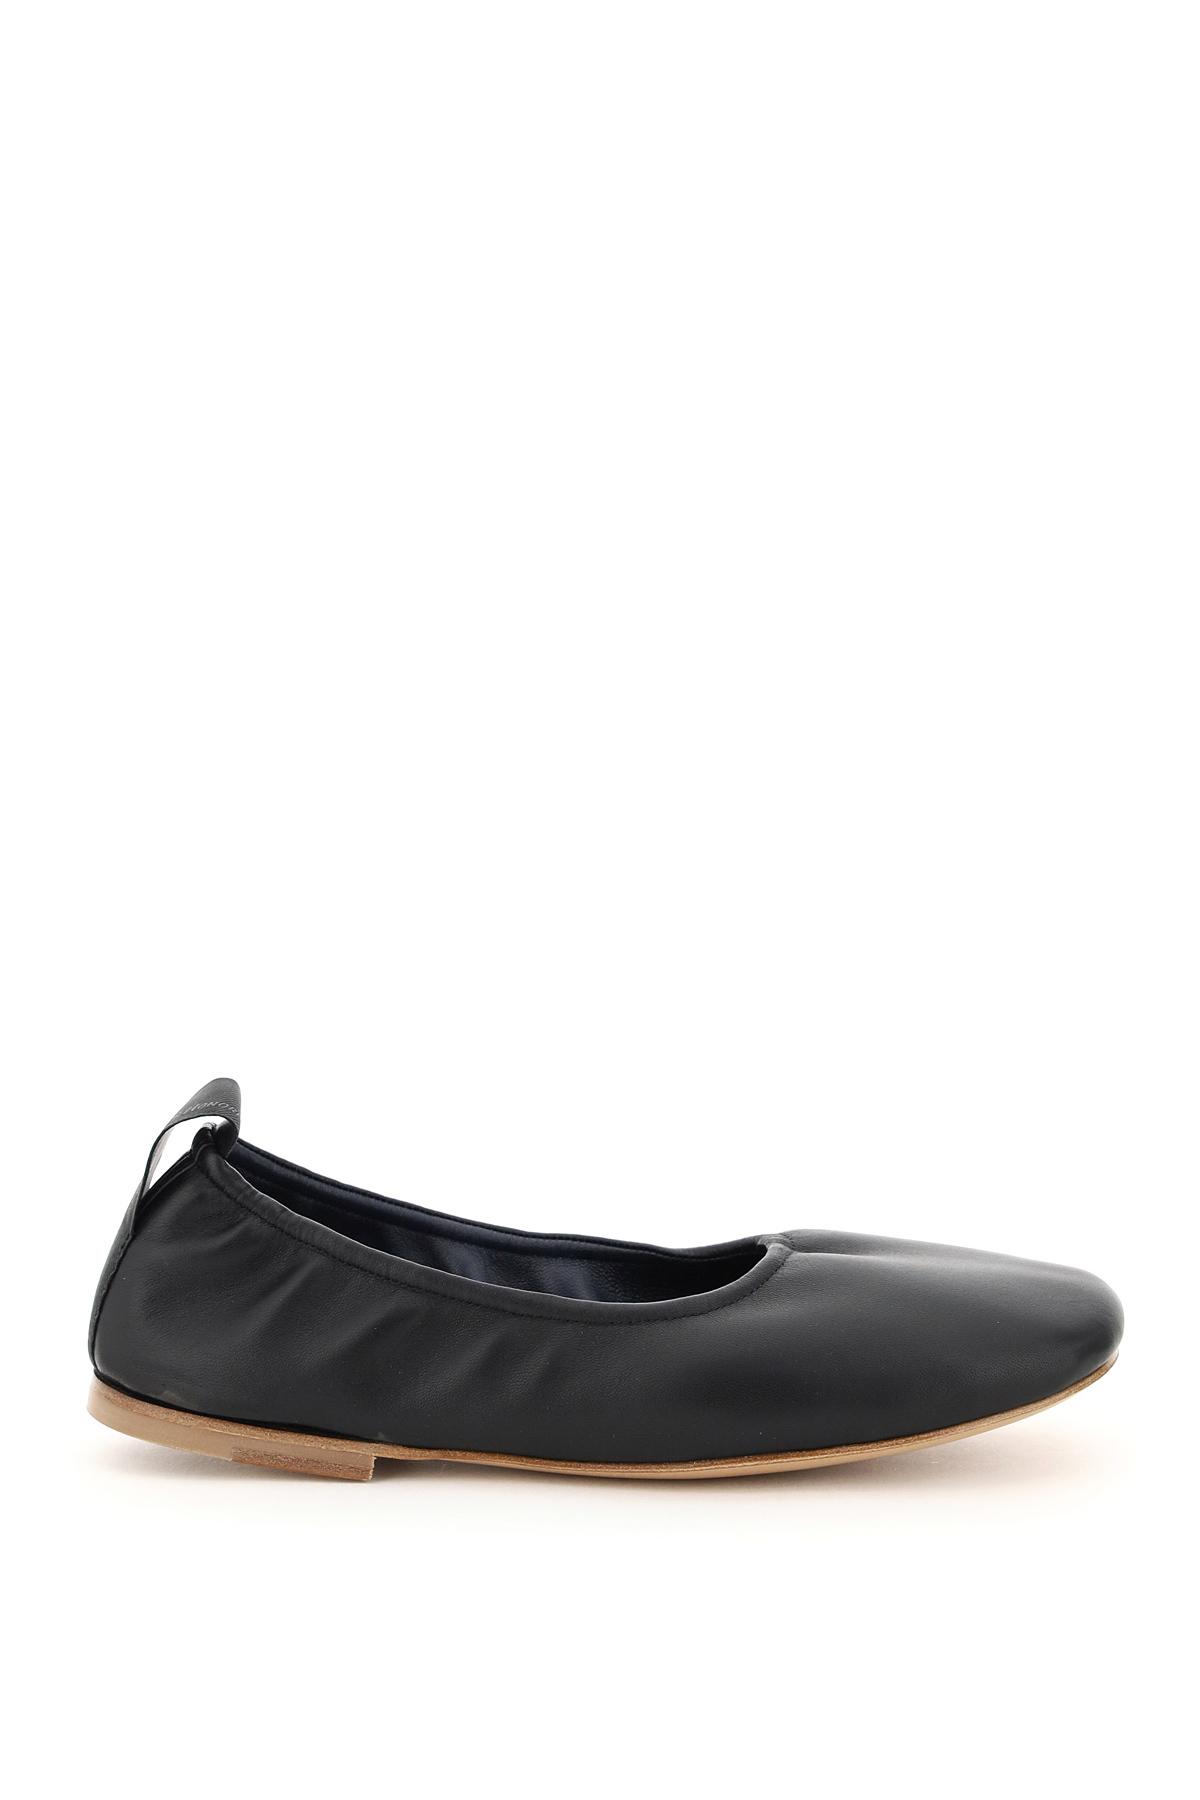 LANVIN SOFT NAPPA BALLET FLATS 37 Black Leather